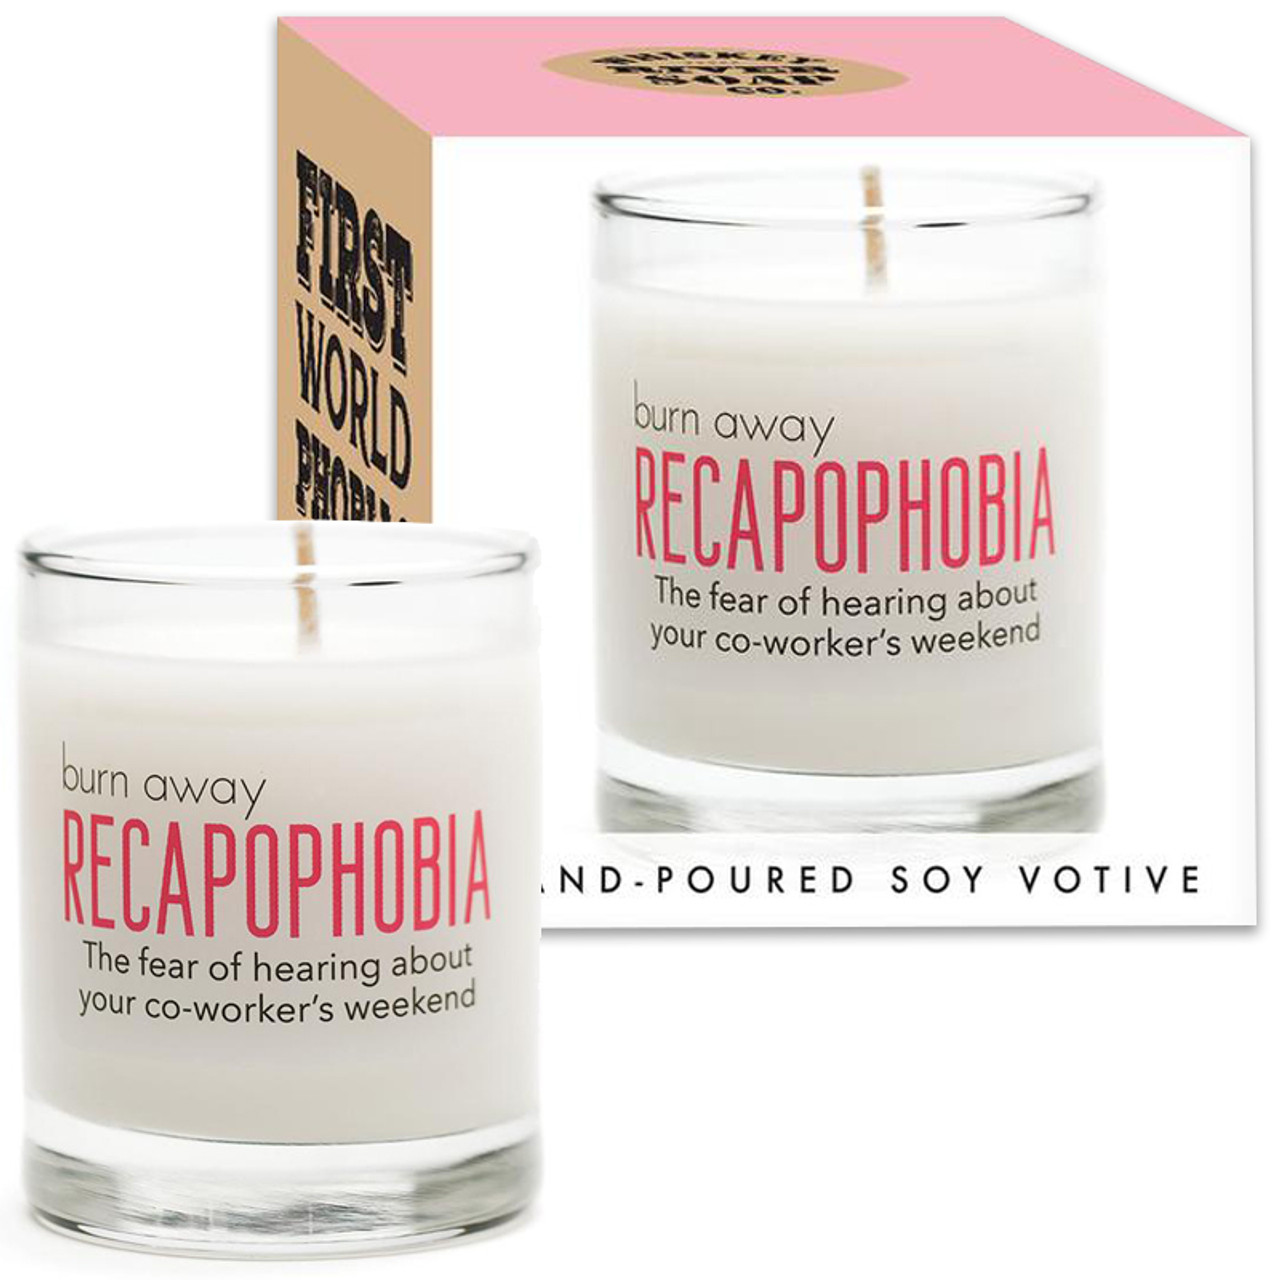 RECAPOPHOBIA Hand Poured Soy Votive Candle